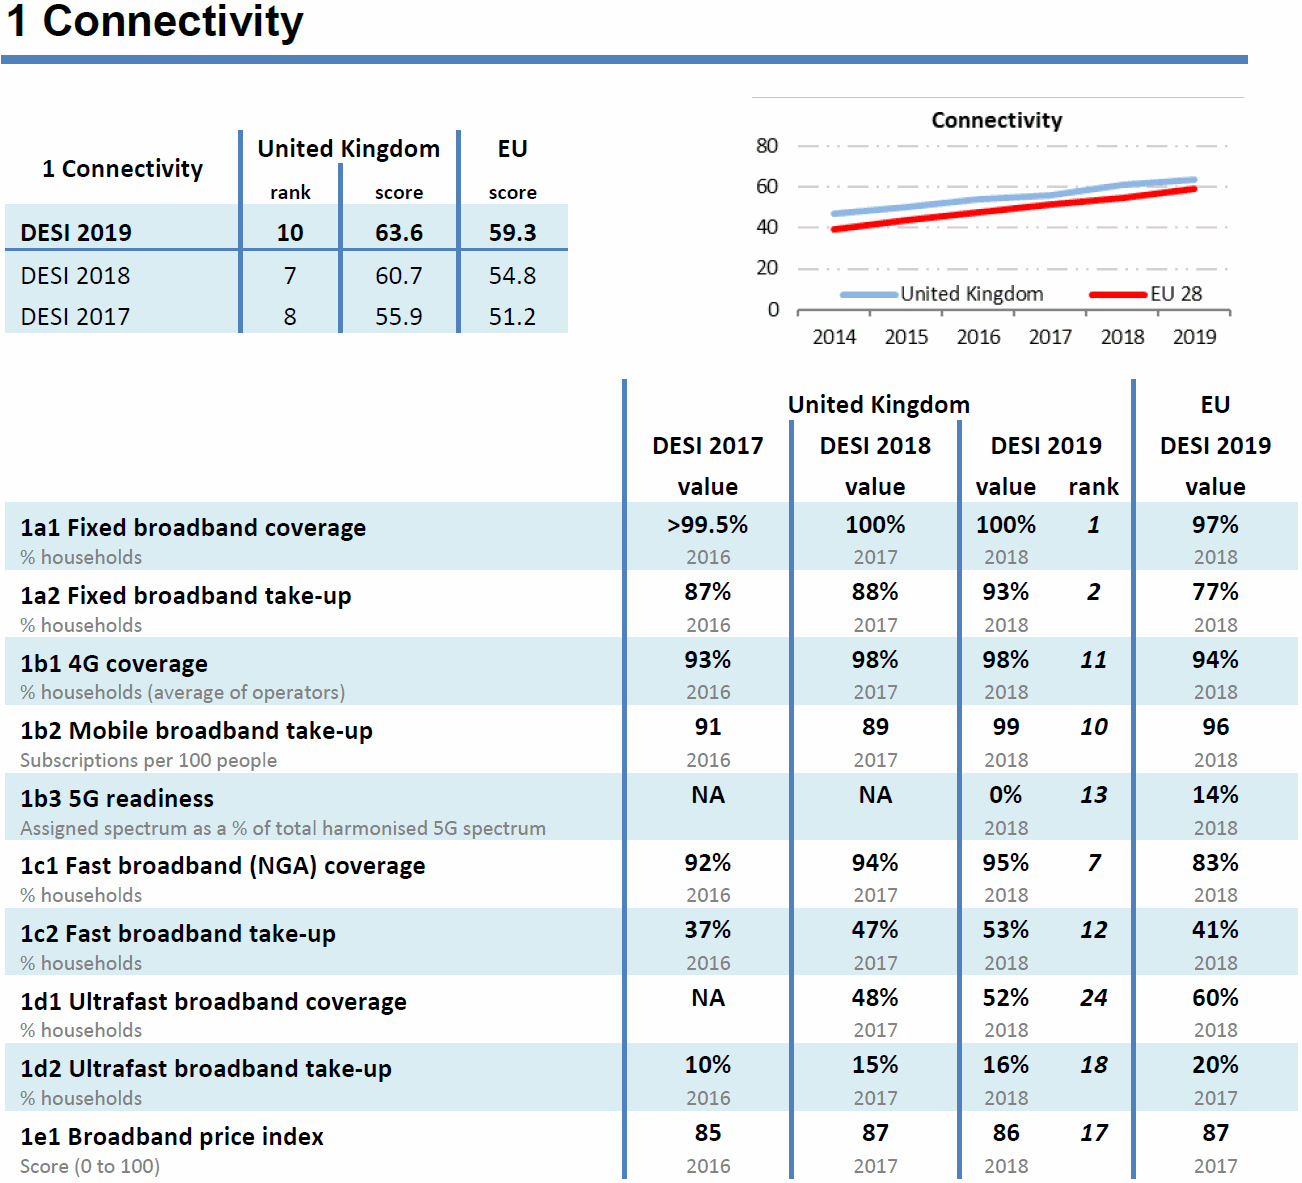 eu_desi_2019_broadband_and_mobile_connectivity